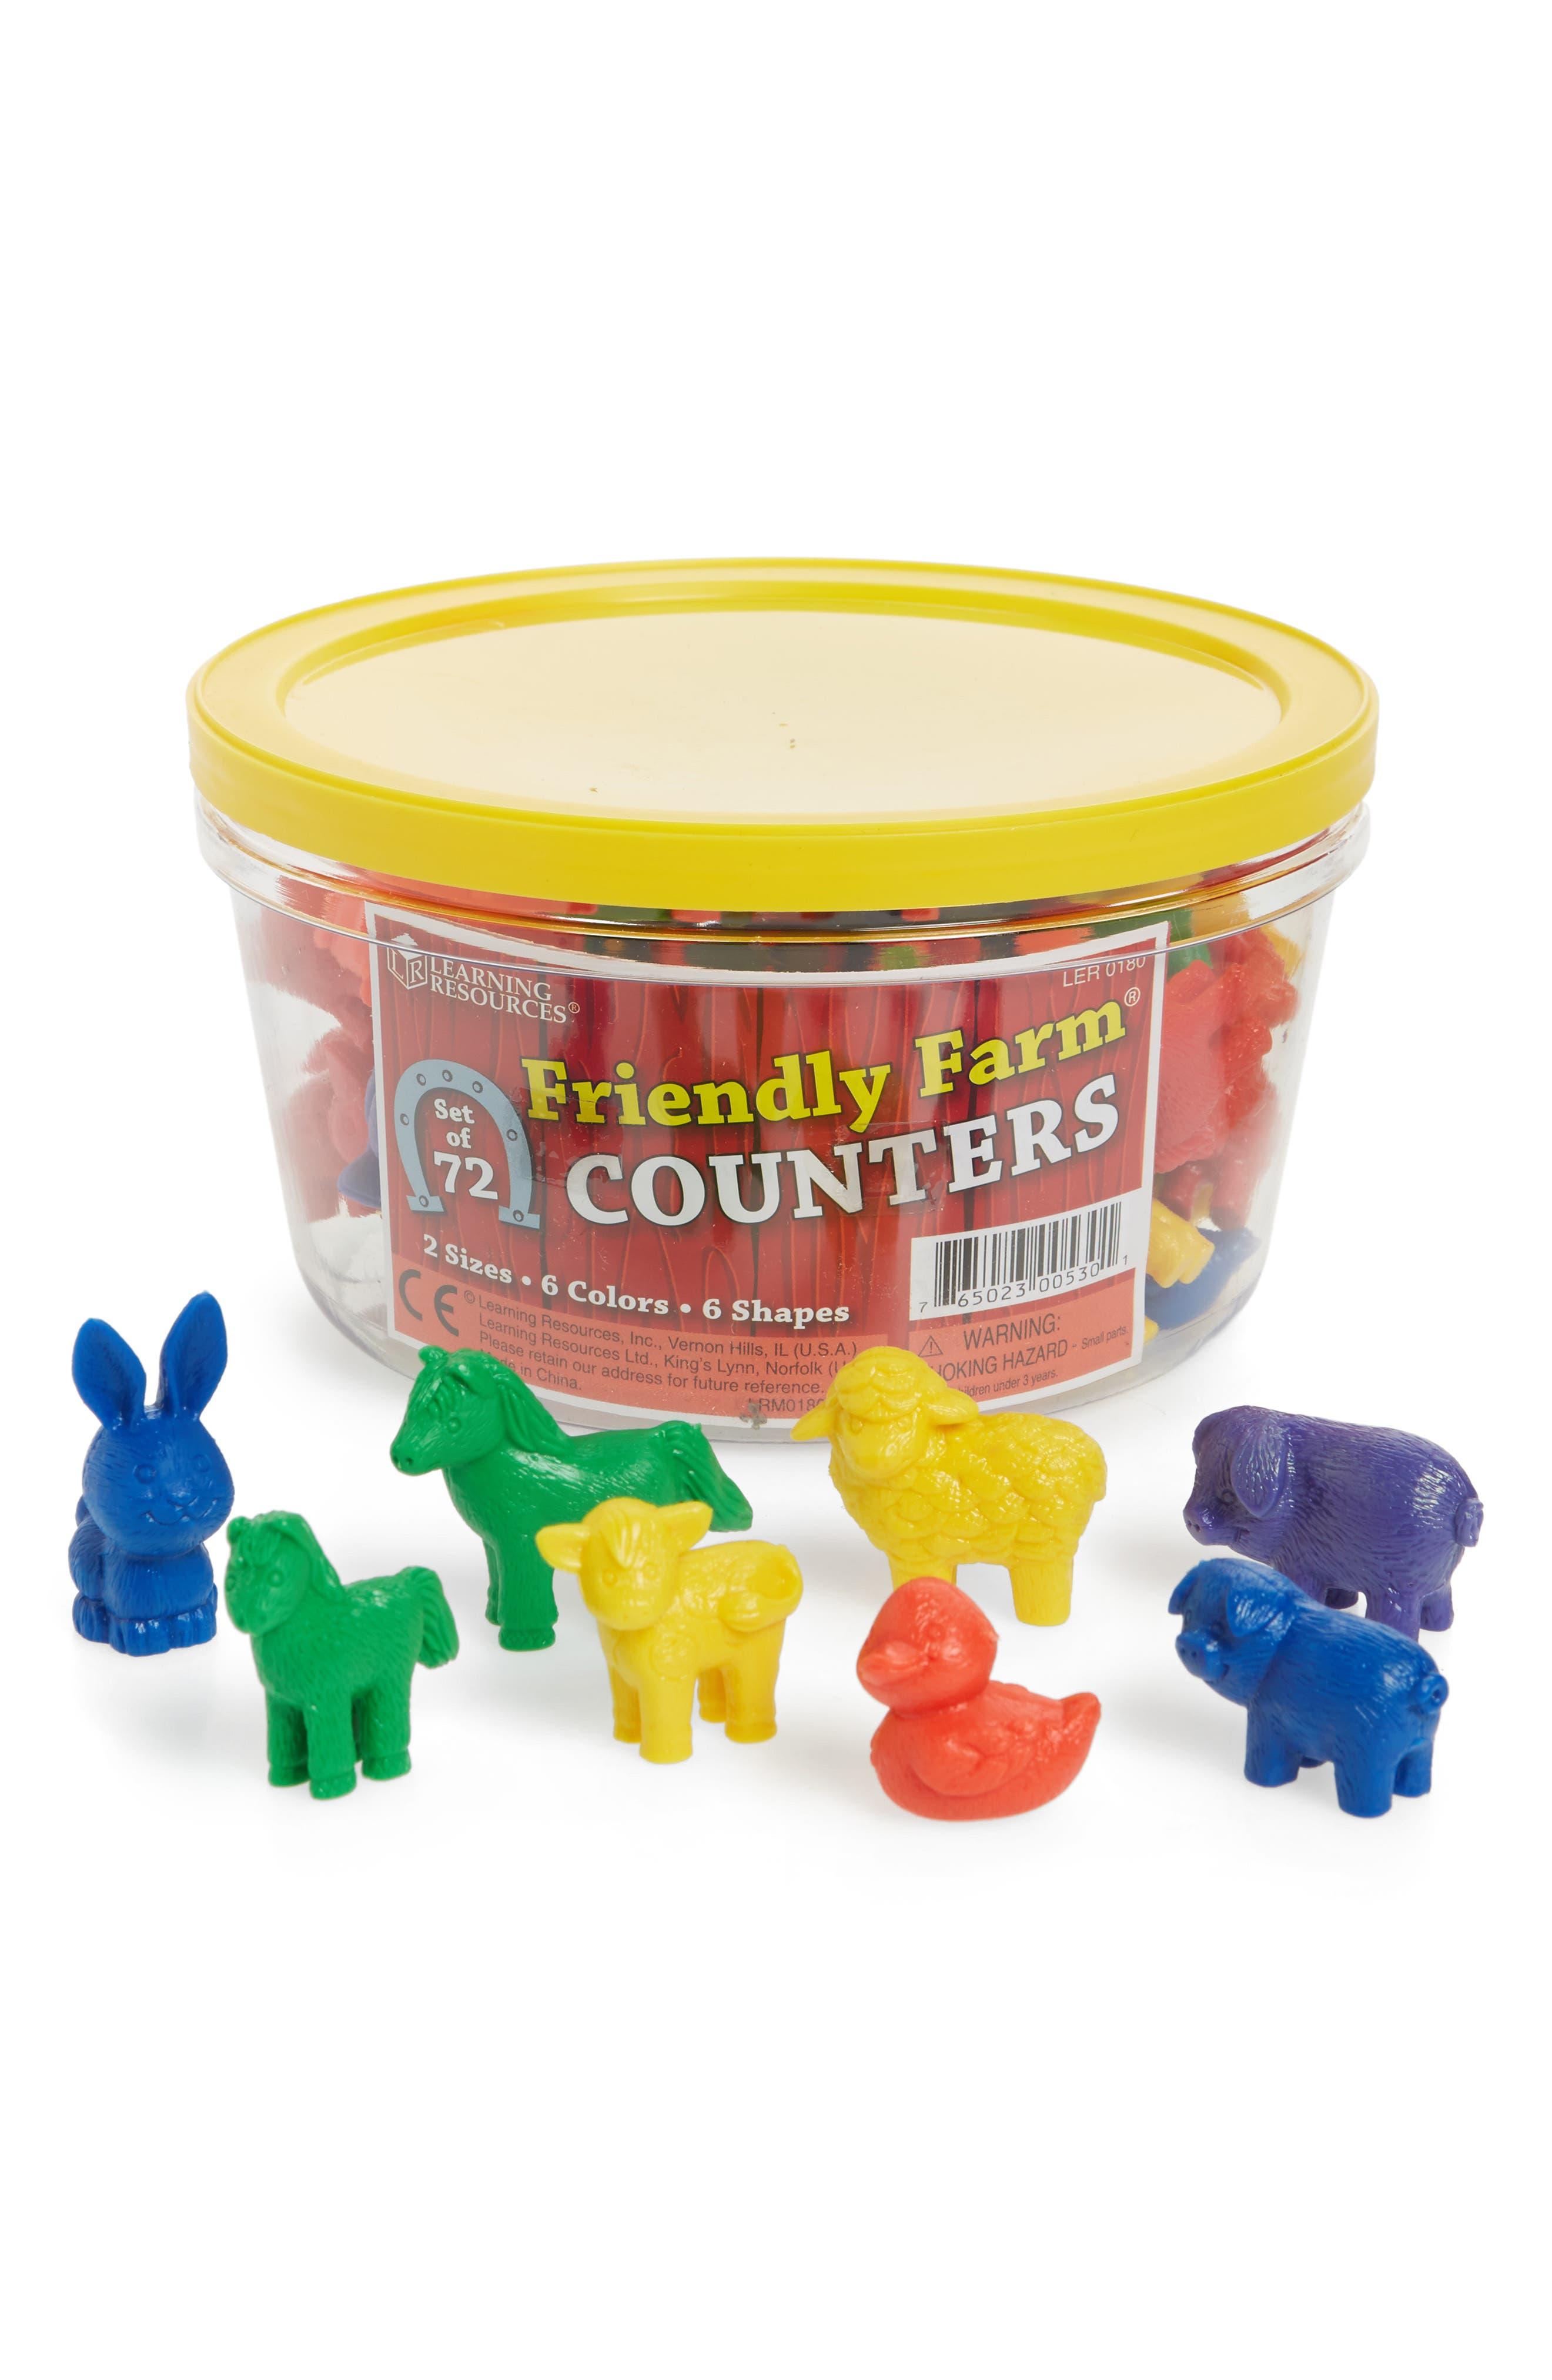 72-Piece Friendly Farm Counters Play Set,                             Main thumbnail 1, color,                             700